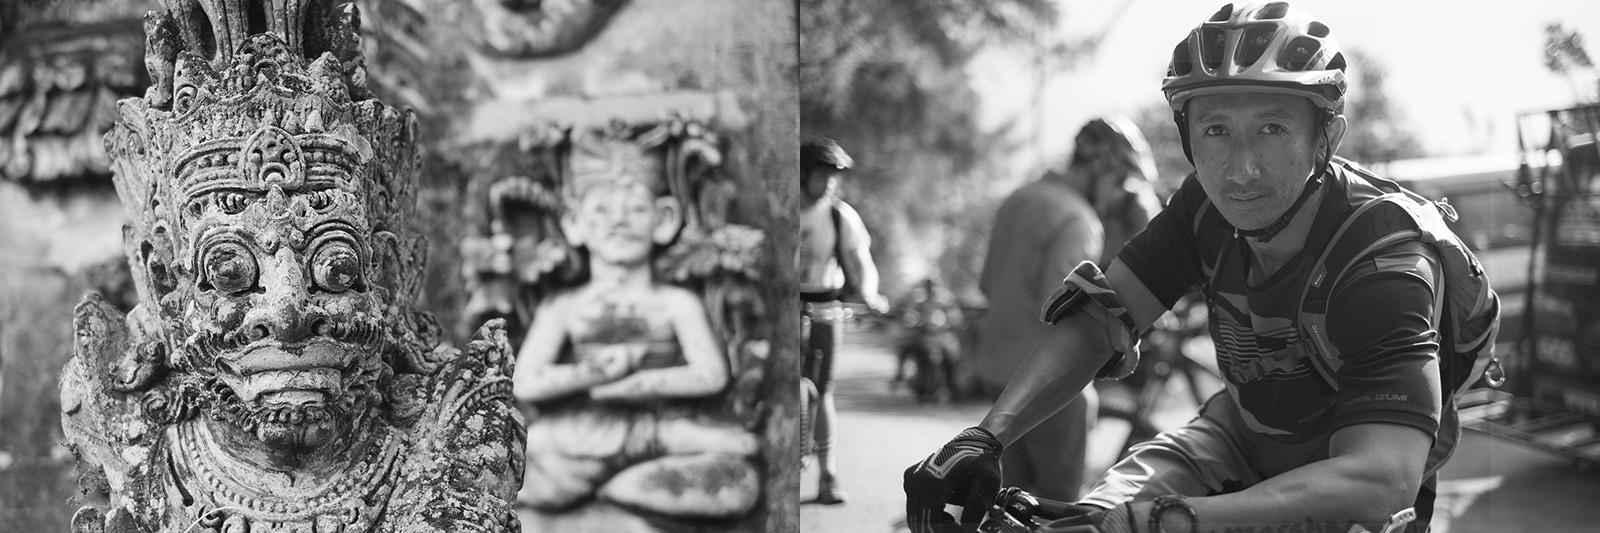 Rahmat Saefudin in Bali Indonesia